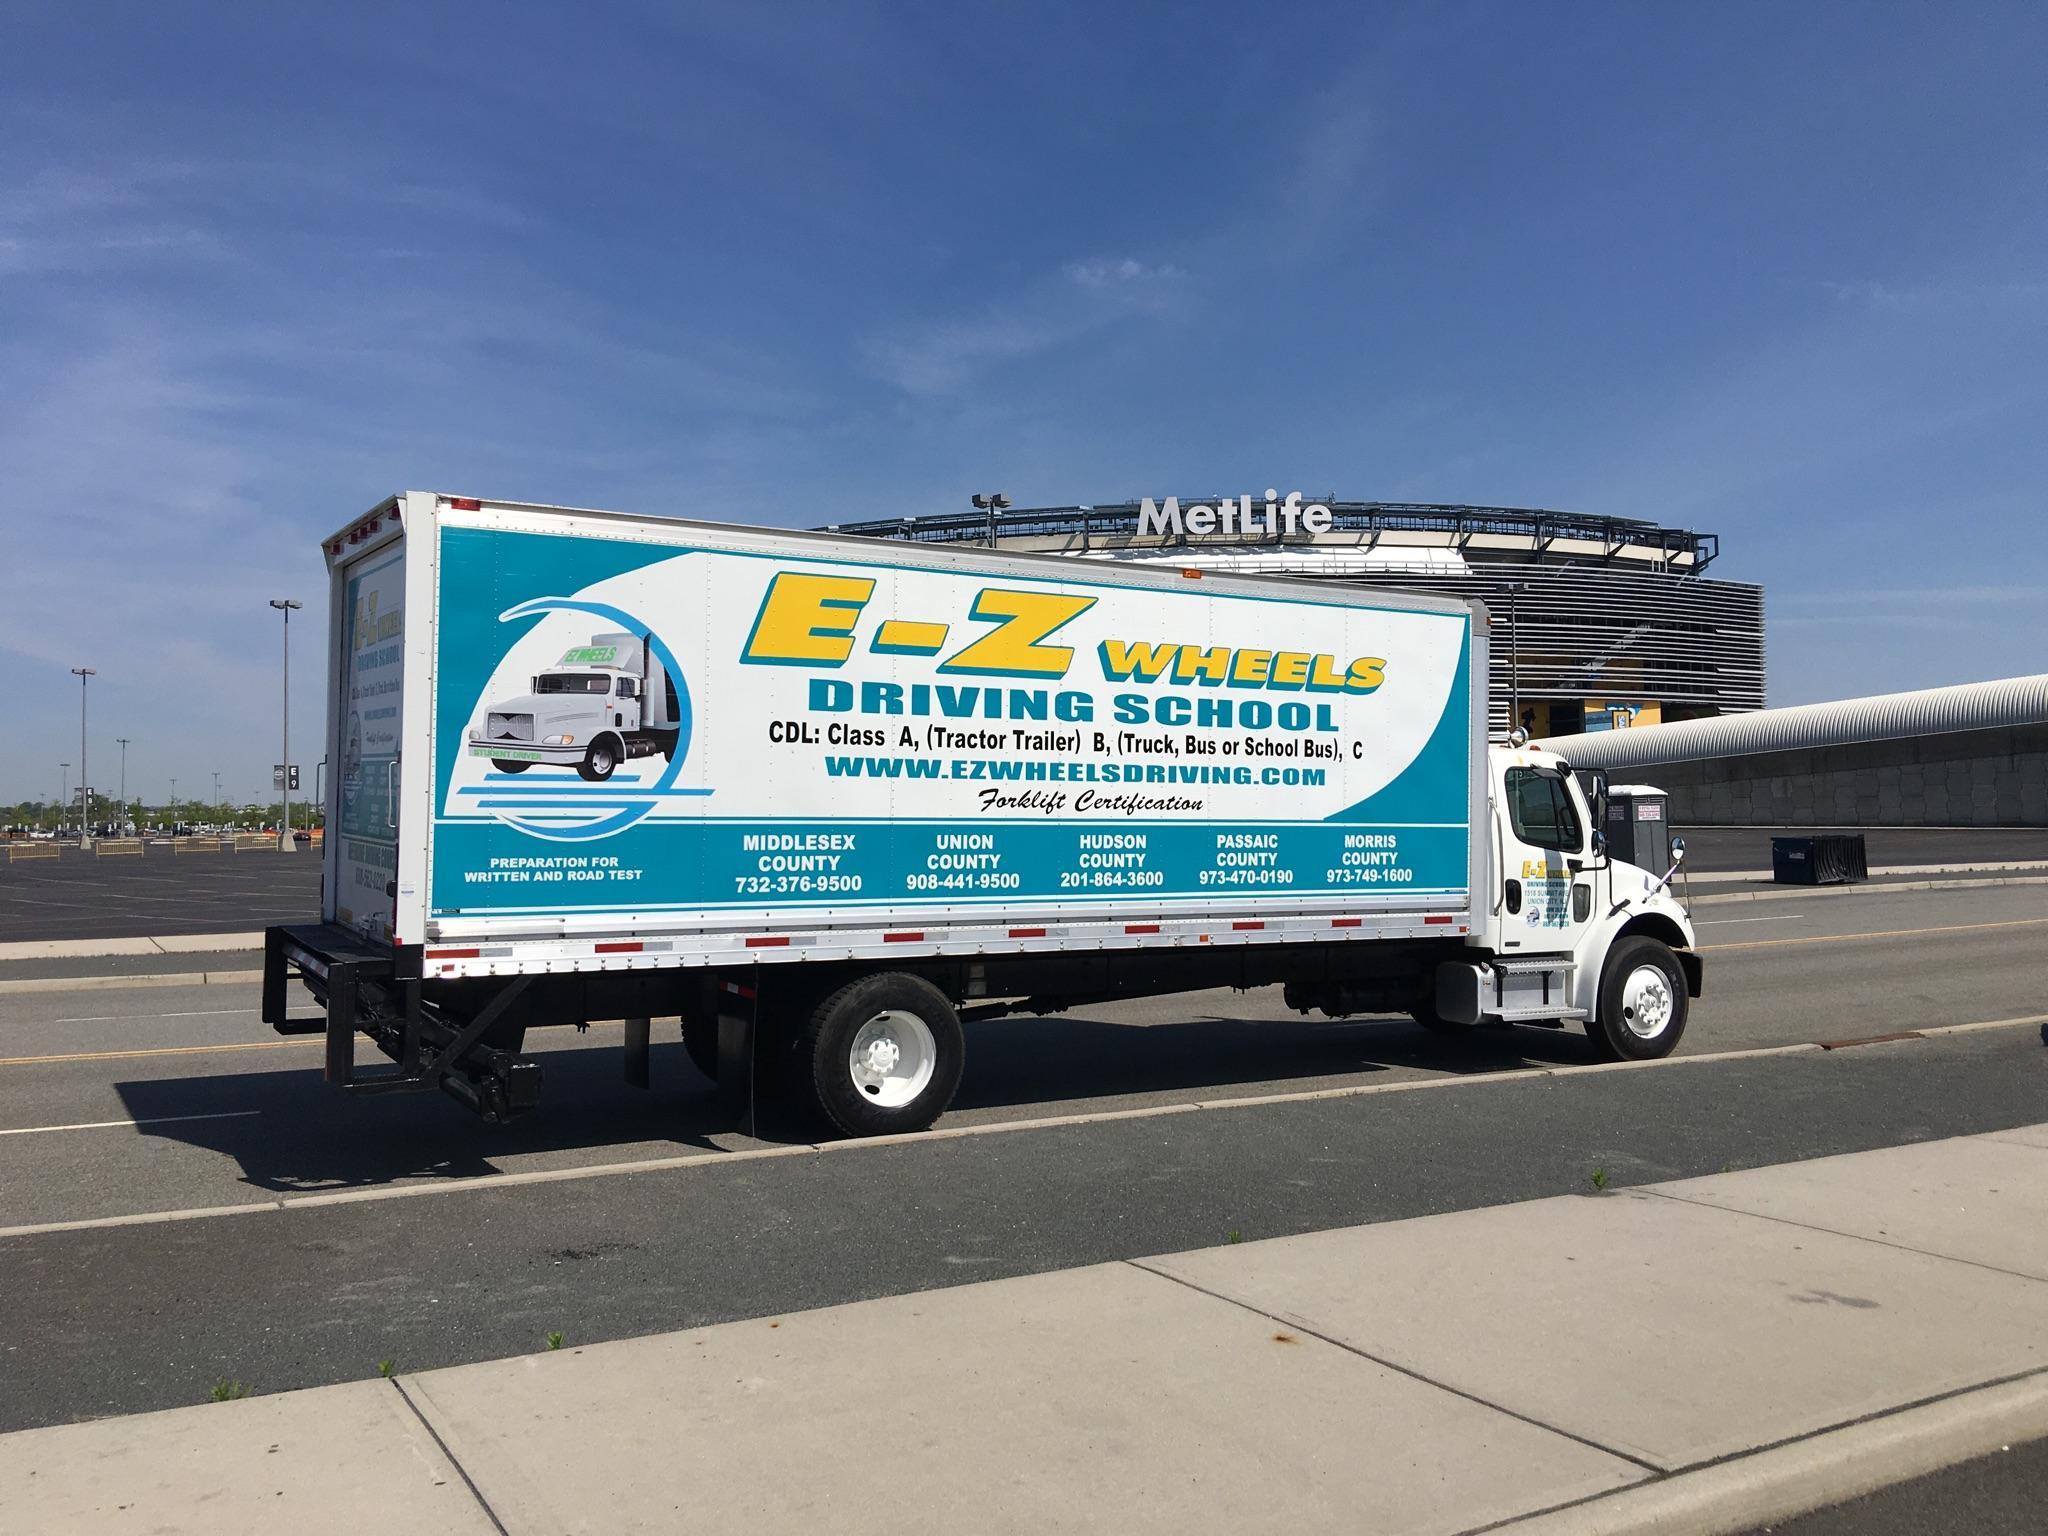 E Z Wheels Driving School Dover Nj Ezwheelsdriving 973